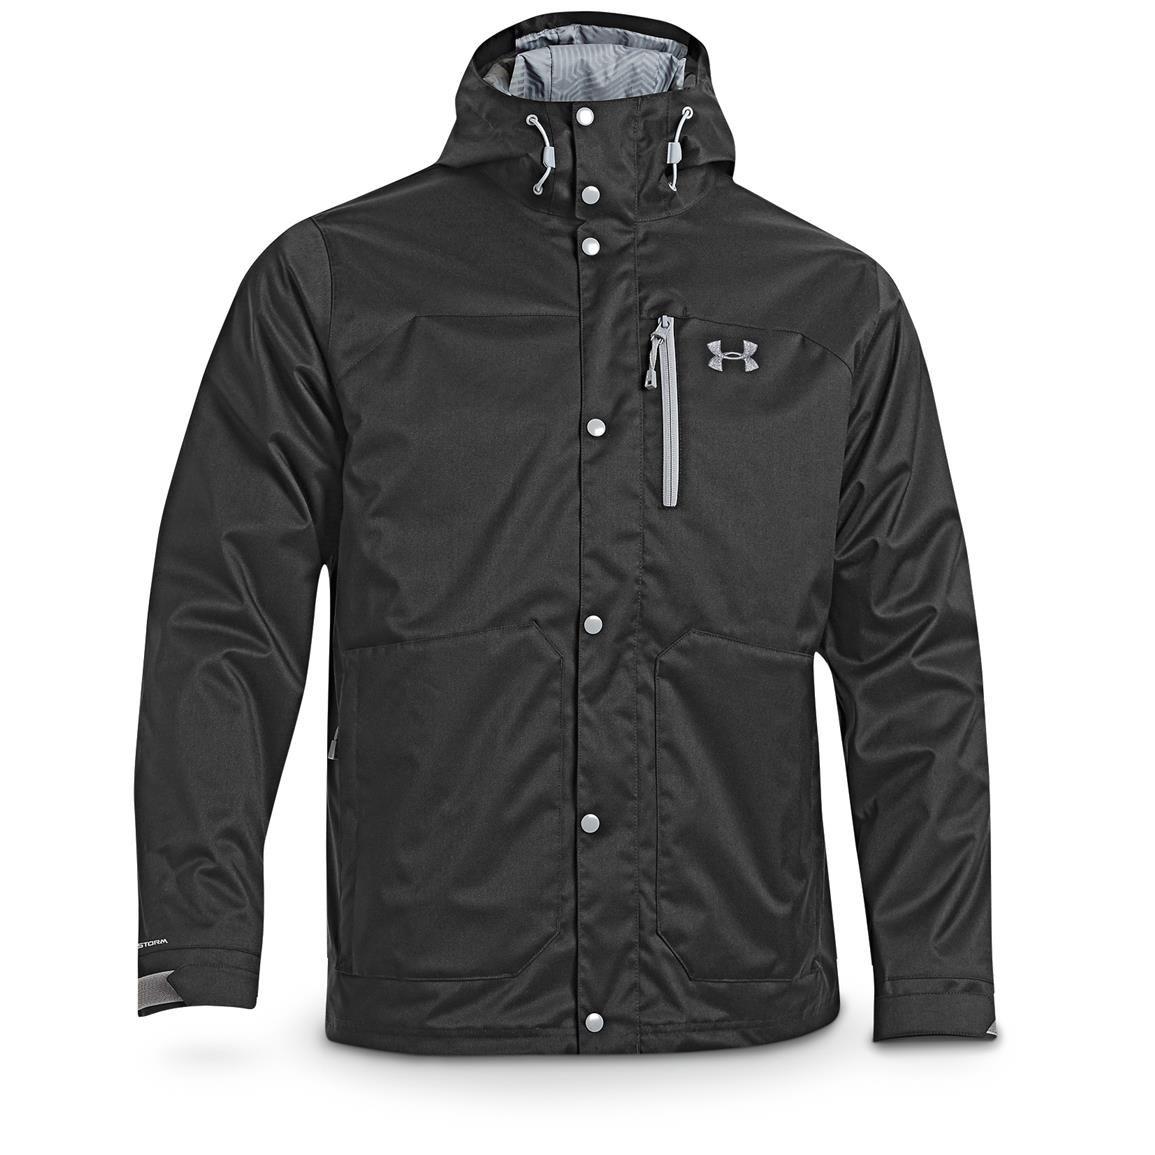 Under Armour mens Porter 3-in-1 Jacket Jacket